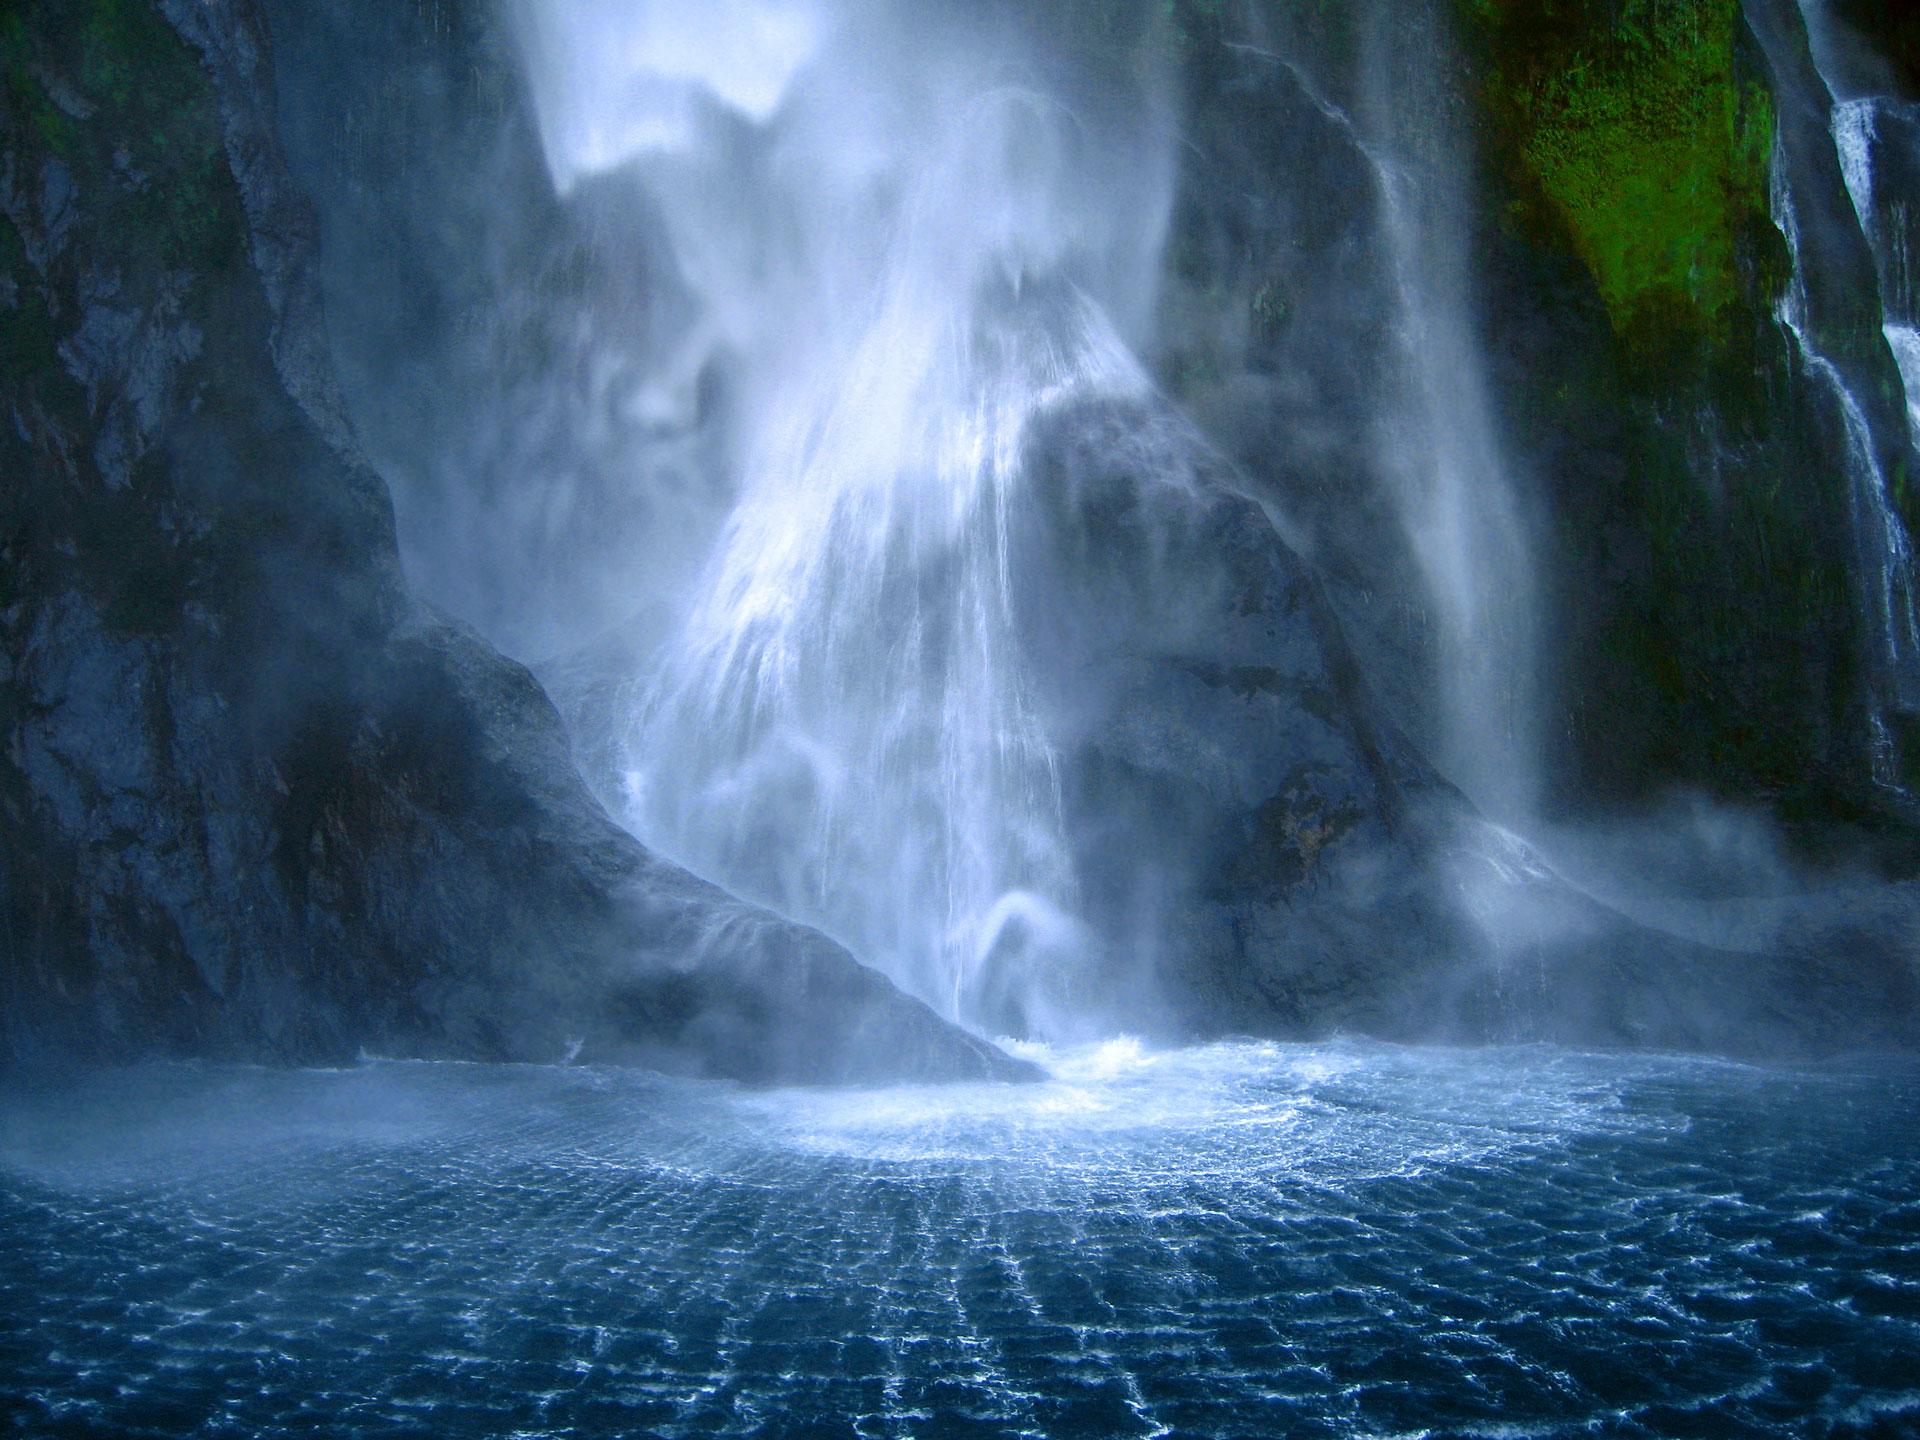 Milford-Sound-falls-cheap-flights-WishandFly-viaje-sorpresa